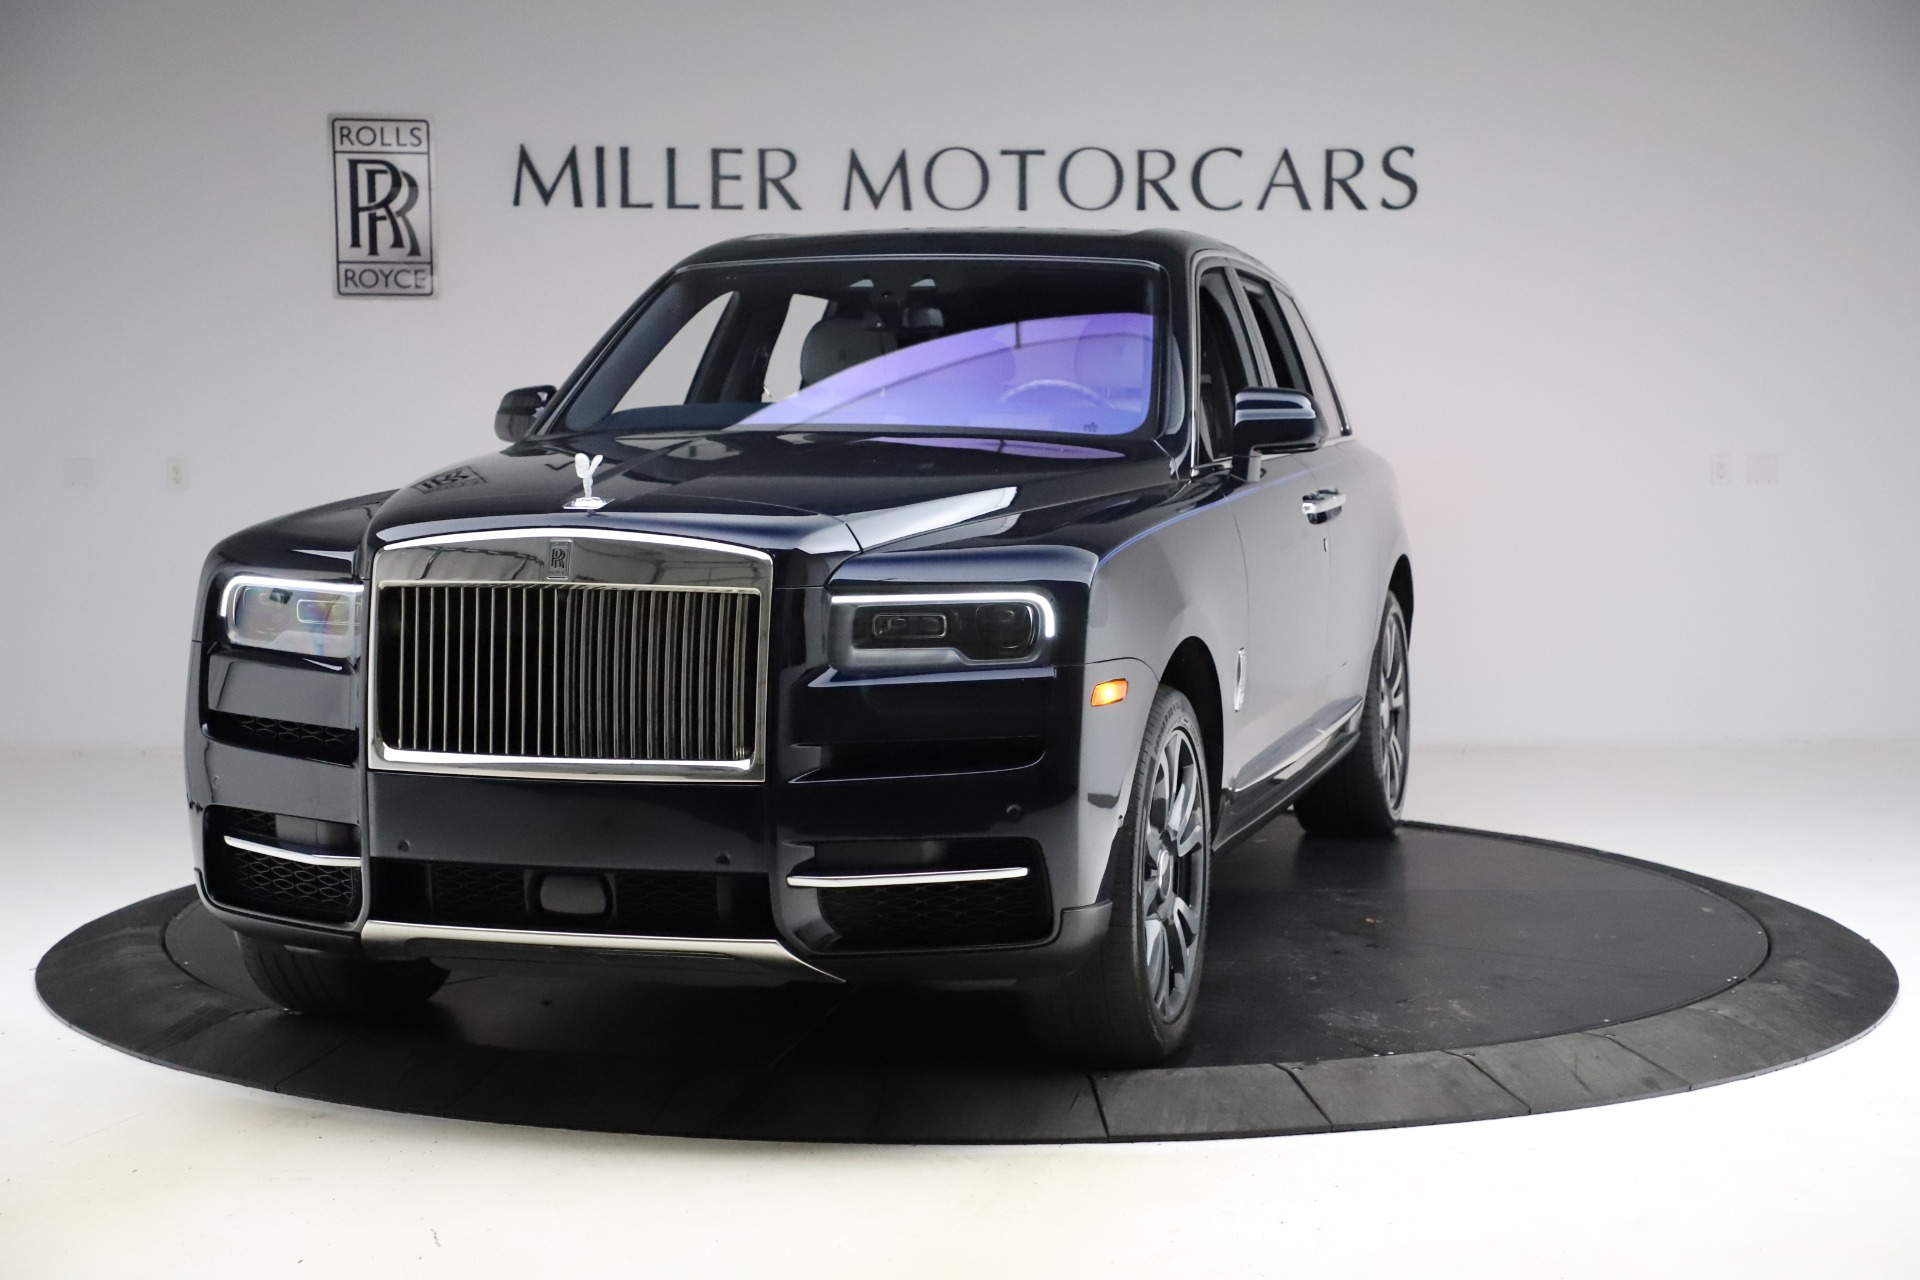 Used 2019 Rolls-Royce Cullinan for sale $349,900 at Rolls-Royce Motor Cars Greenwich in Greenwich CT 06830 1